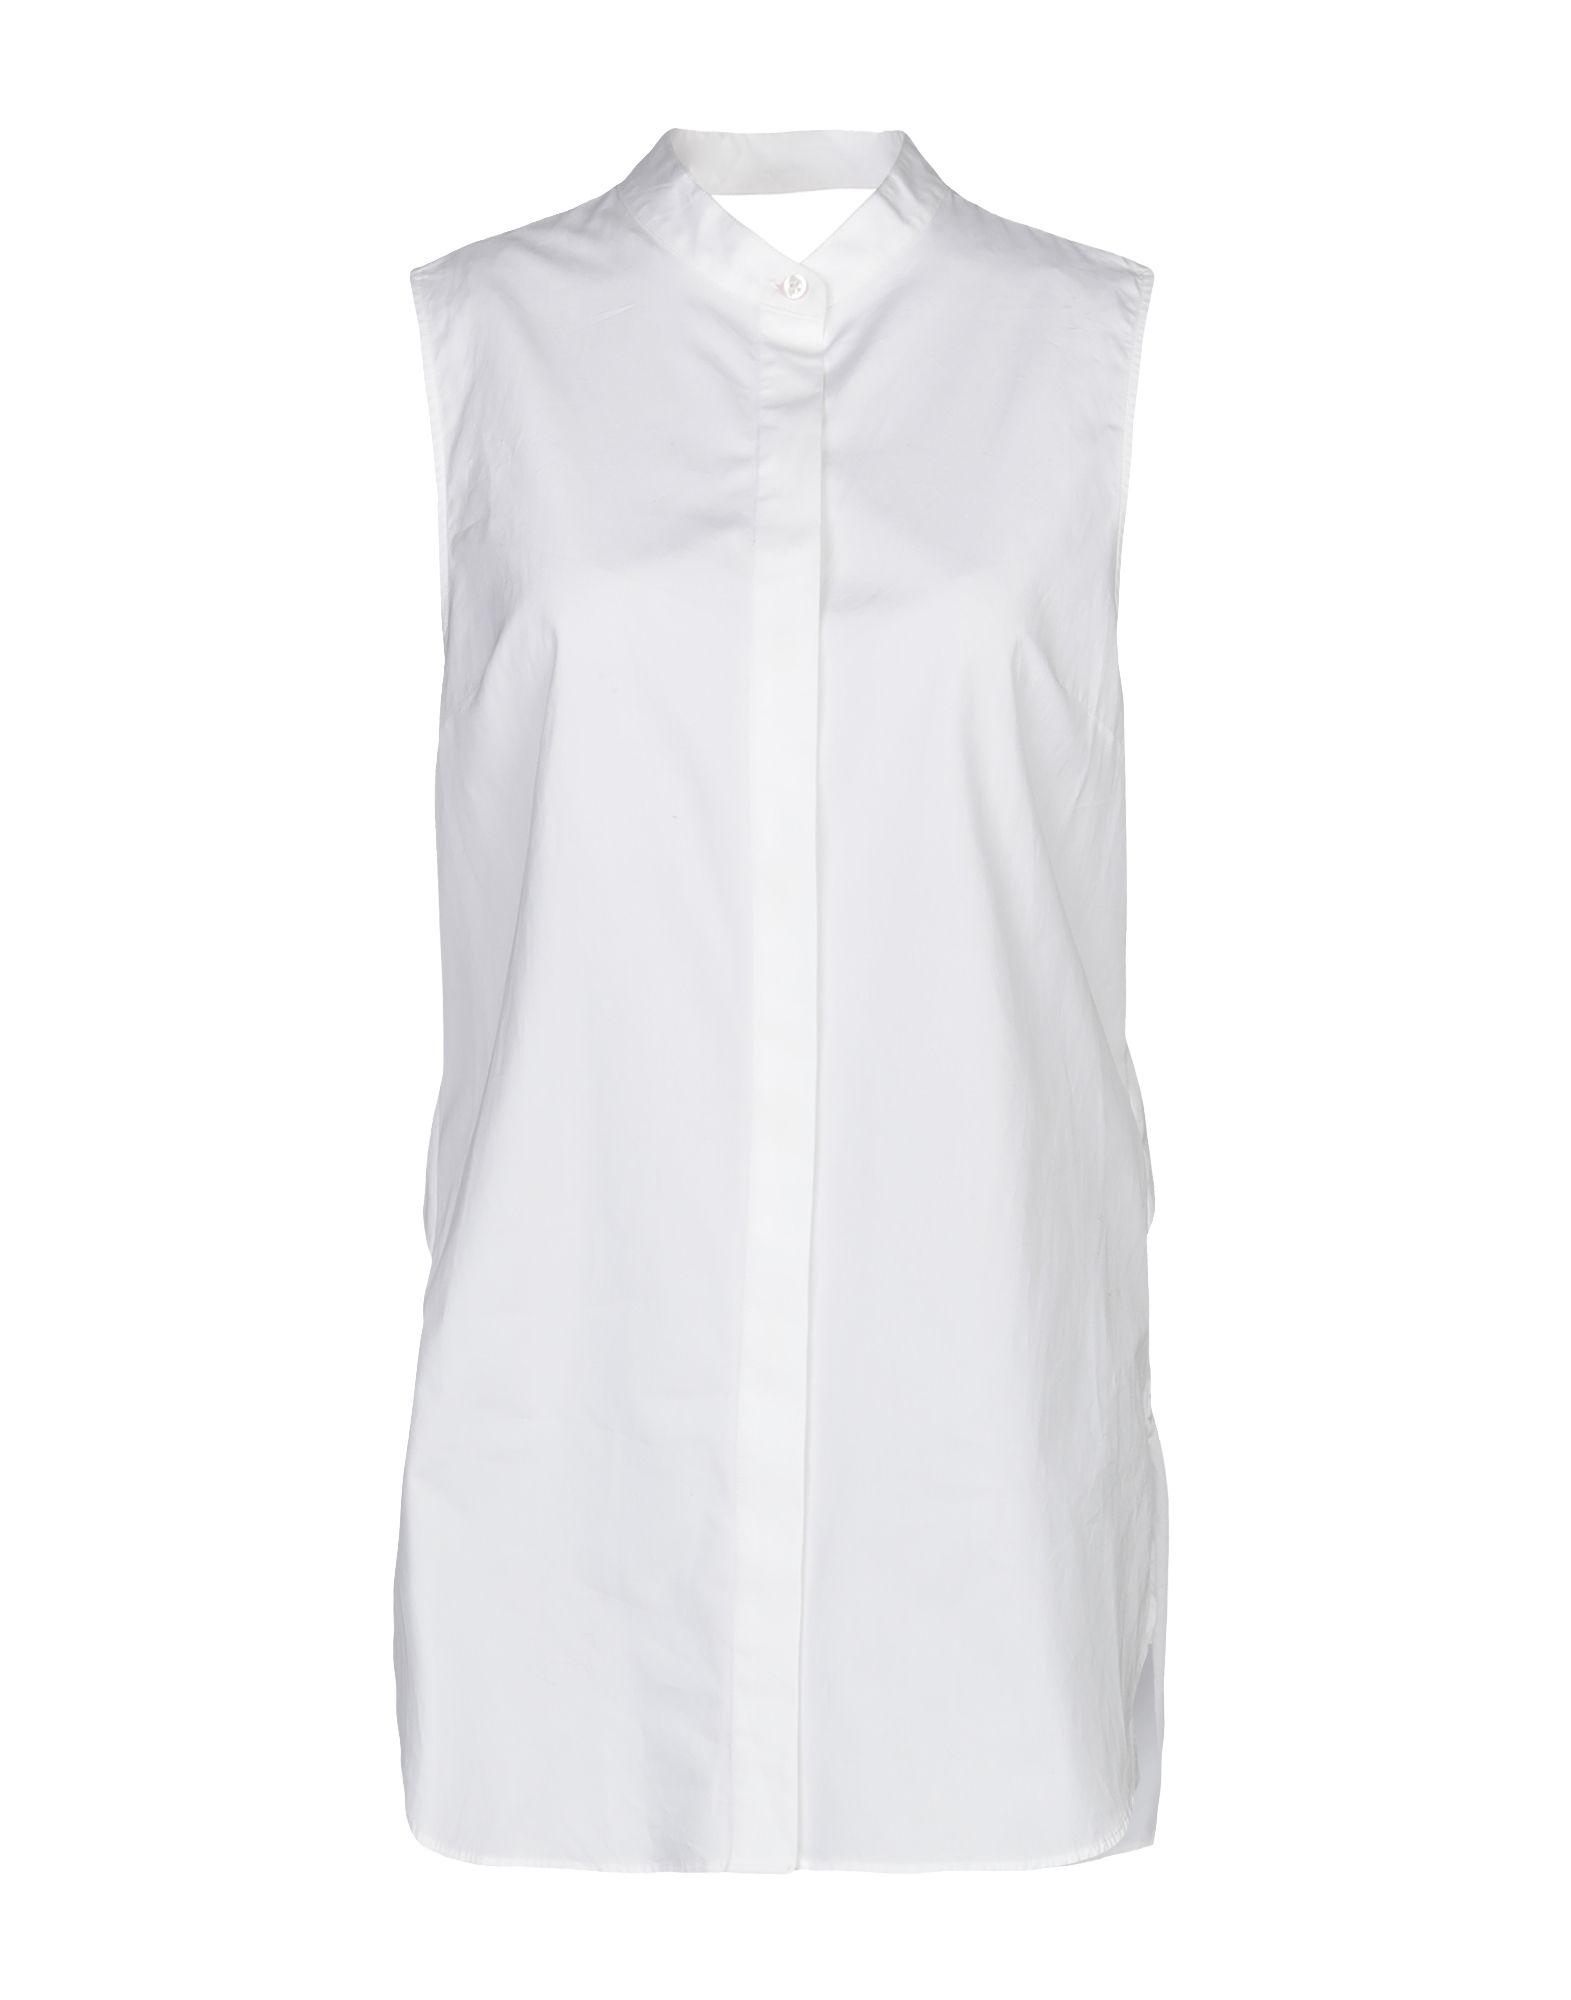 Camicie E Blause Tinta Unita 3.1 Phillip Lim damen - 38829578LK